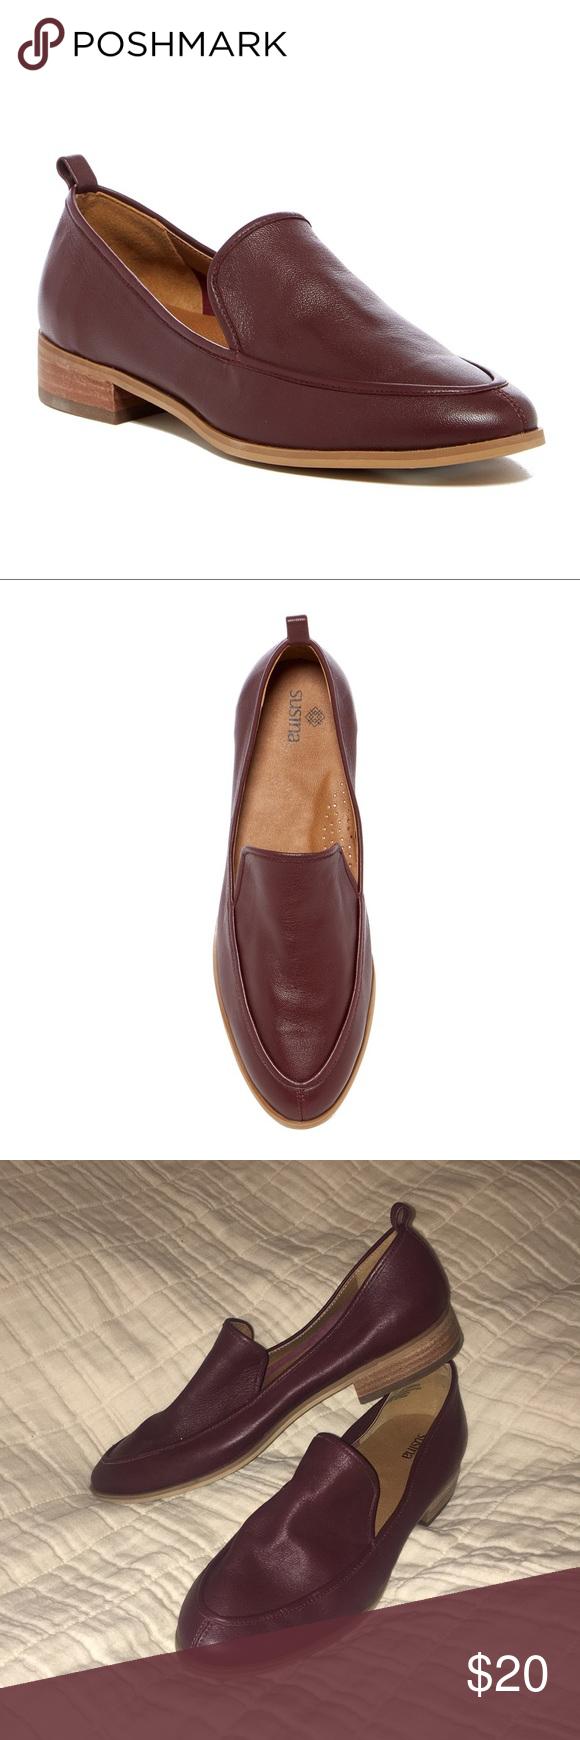 2593fb8ee1d SUSINA Kellen Almond Toe Flat Sizing  True to size. Almond toe. Notched  collar